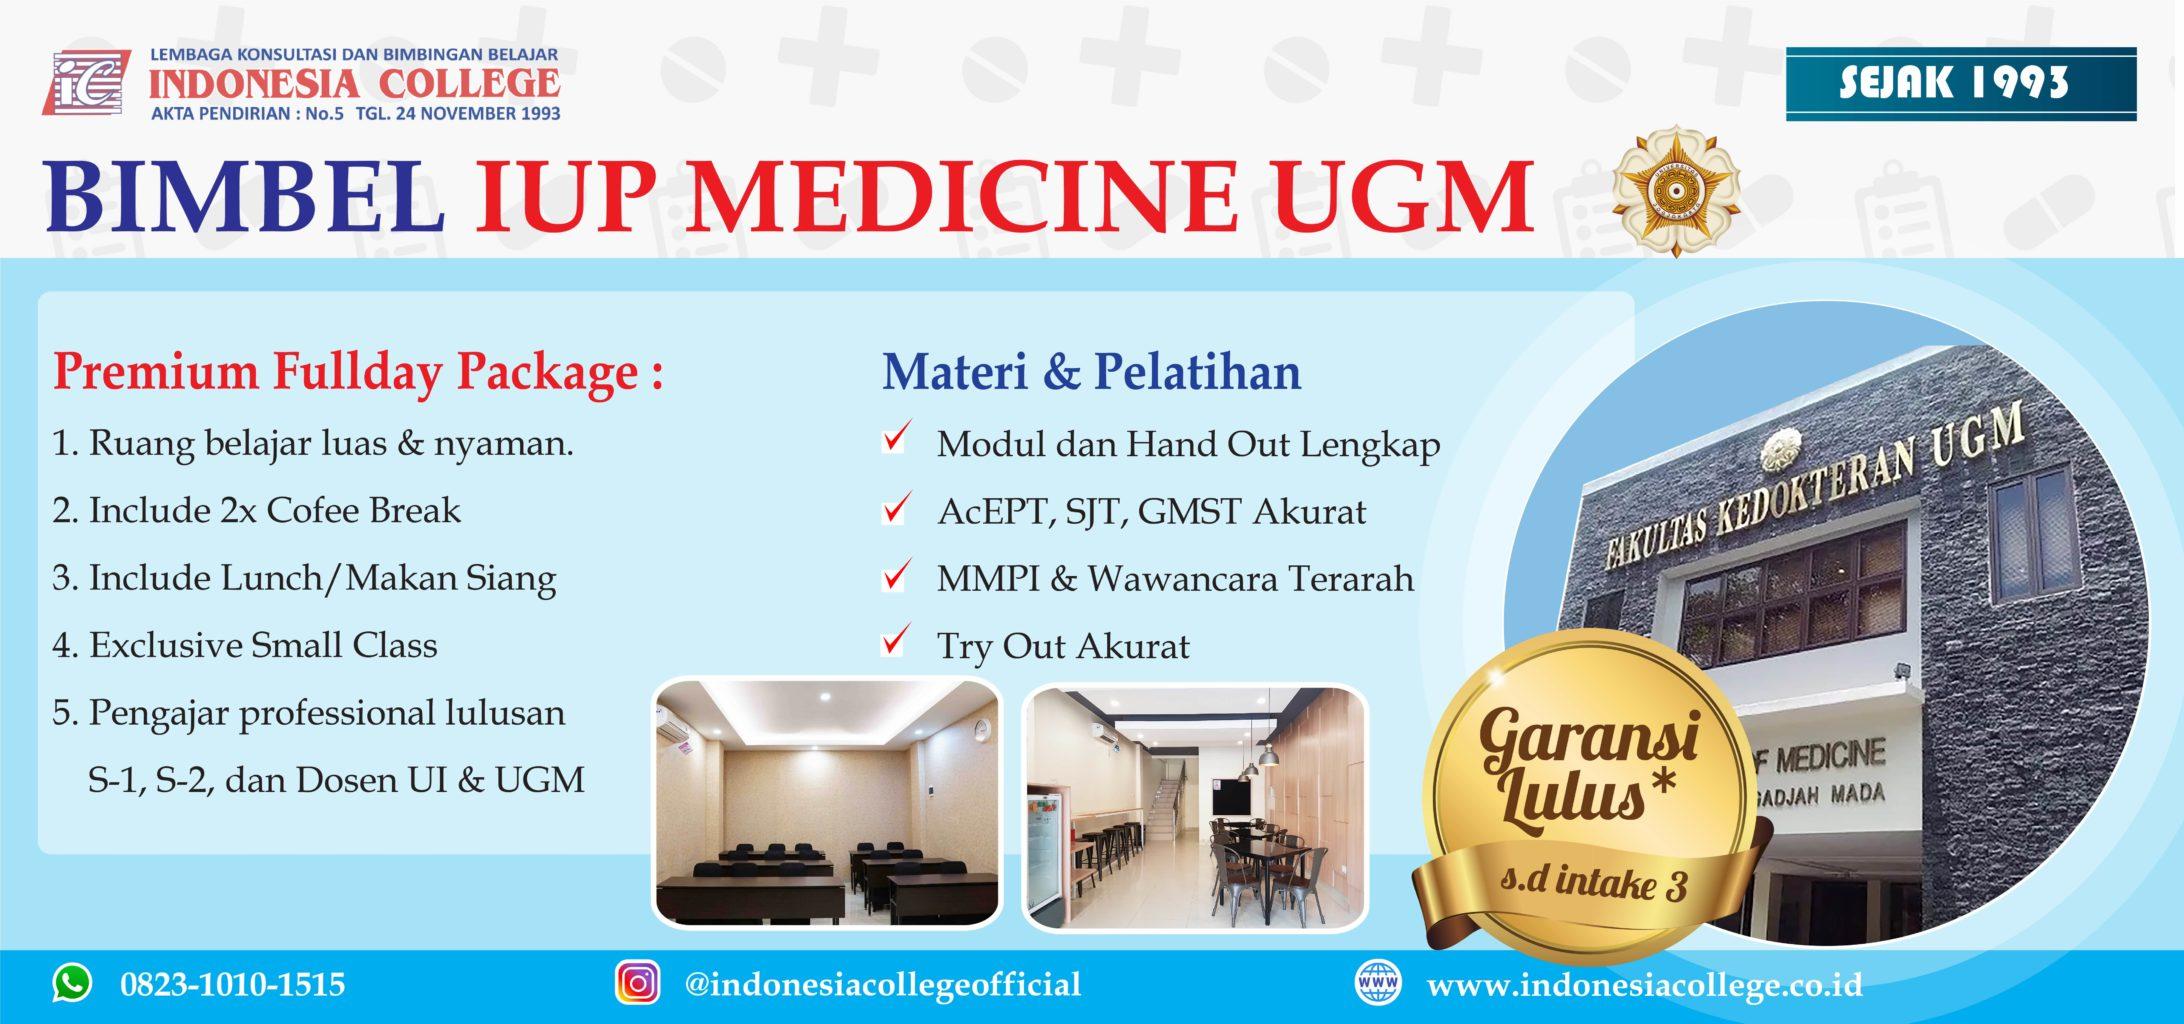 Bimbel IUP Medicine 2022